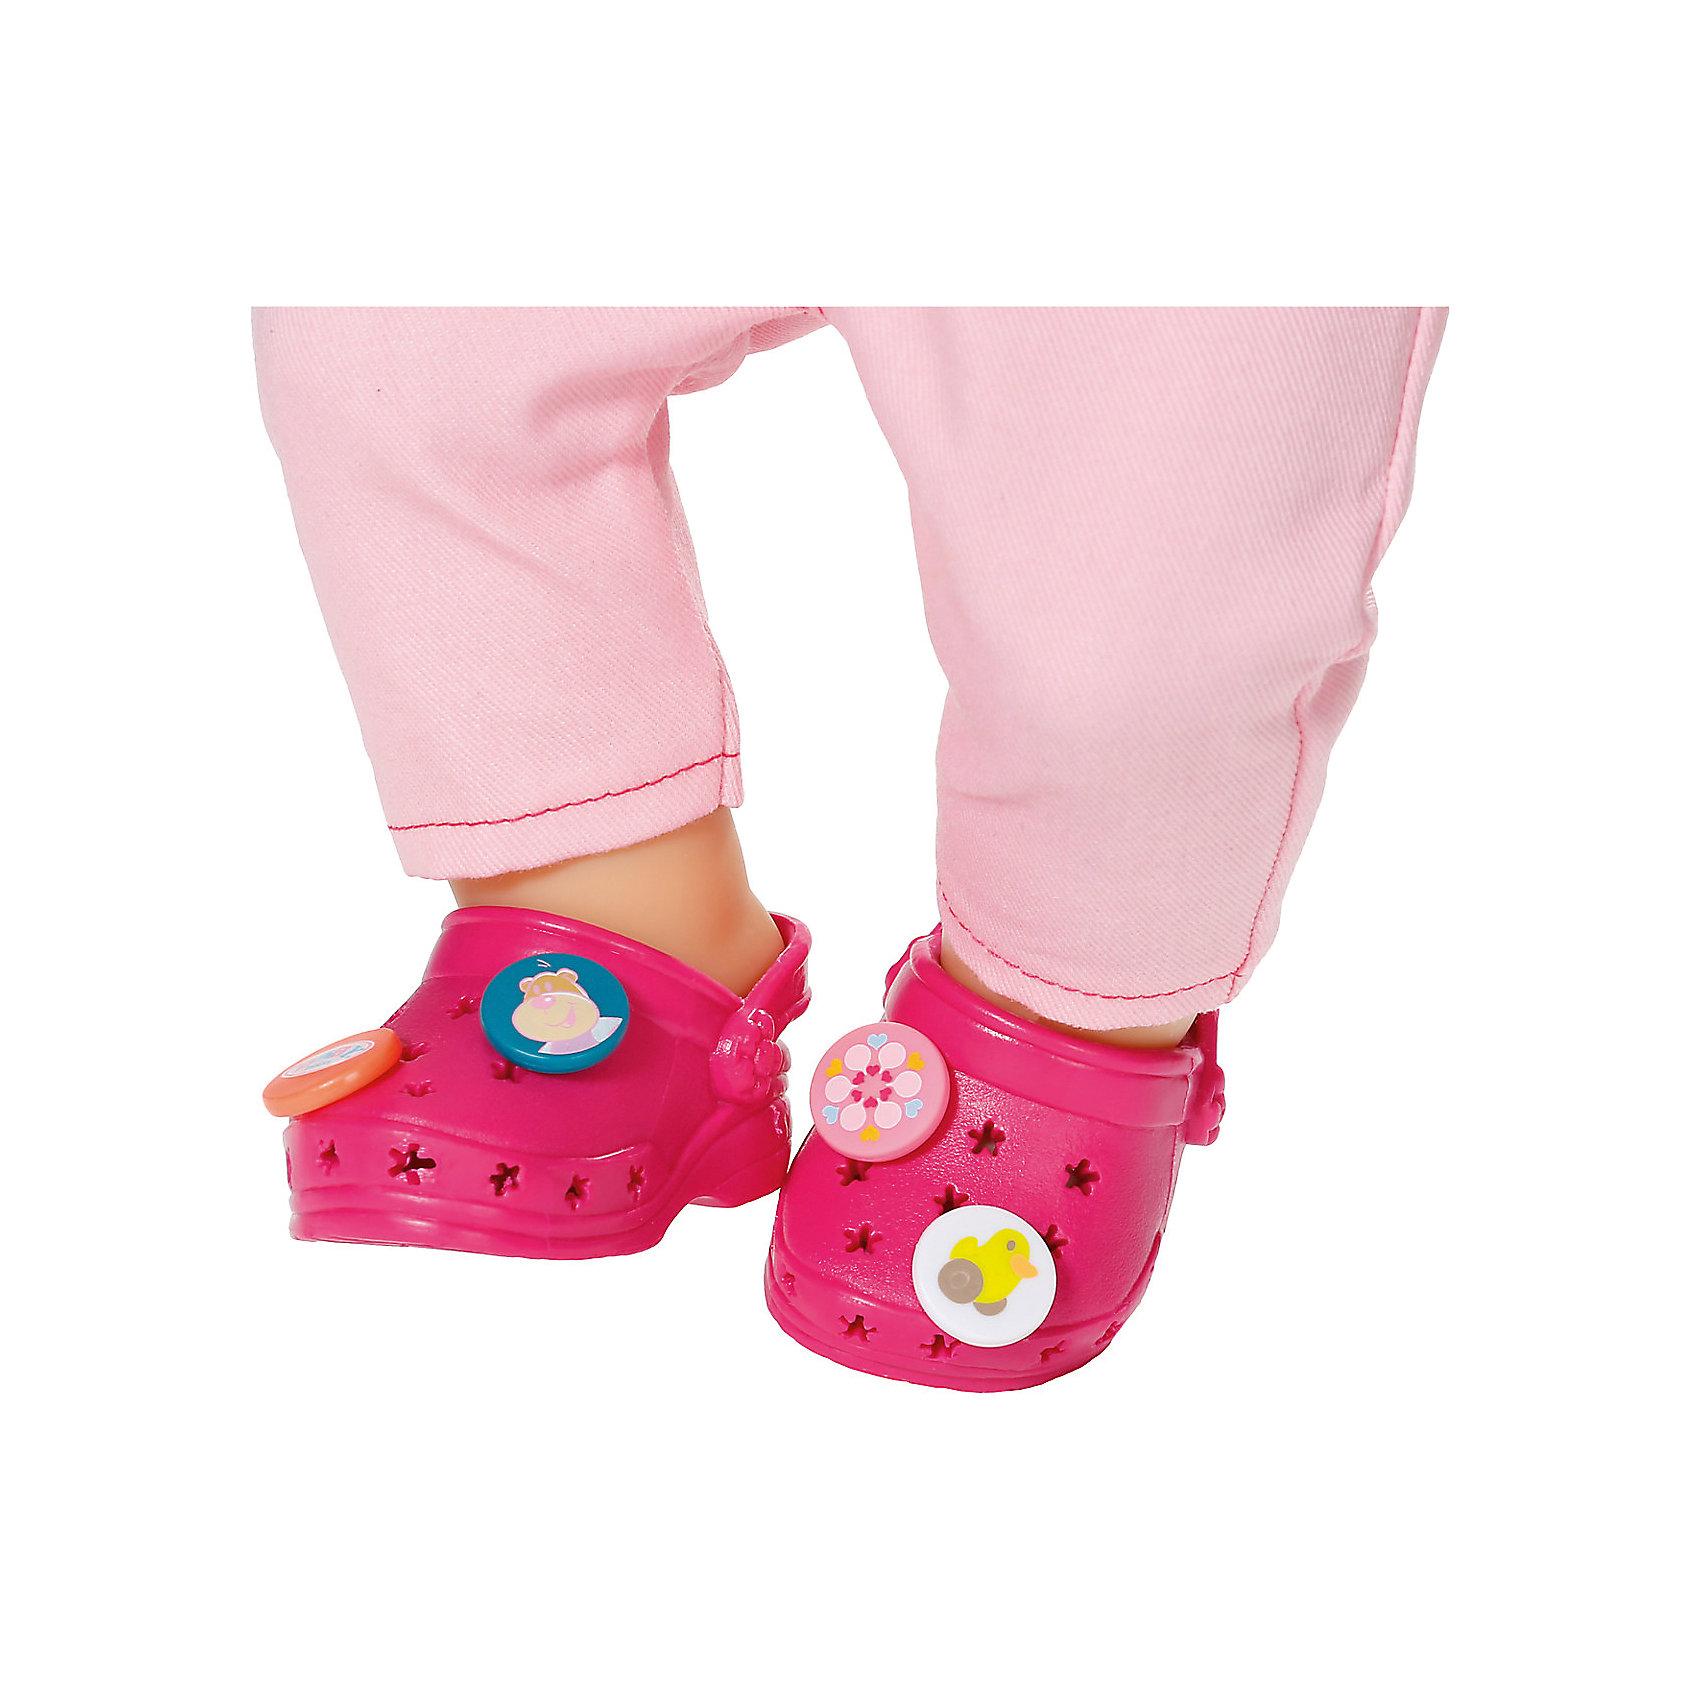 Zapf Creation Сандали фантазийные, розовые, BABY born сандали кожаные